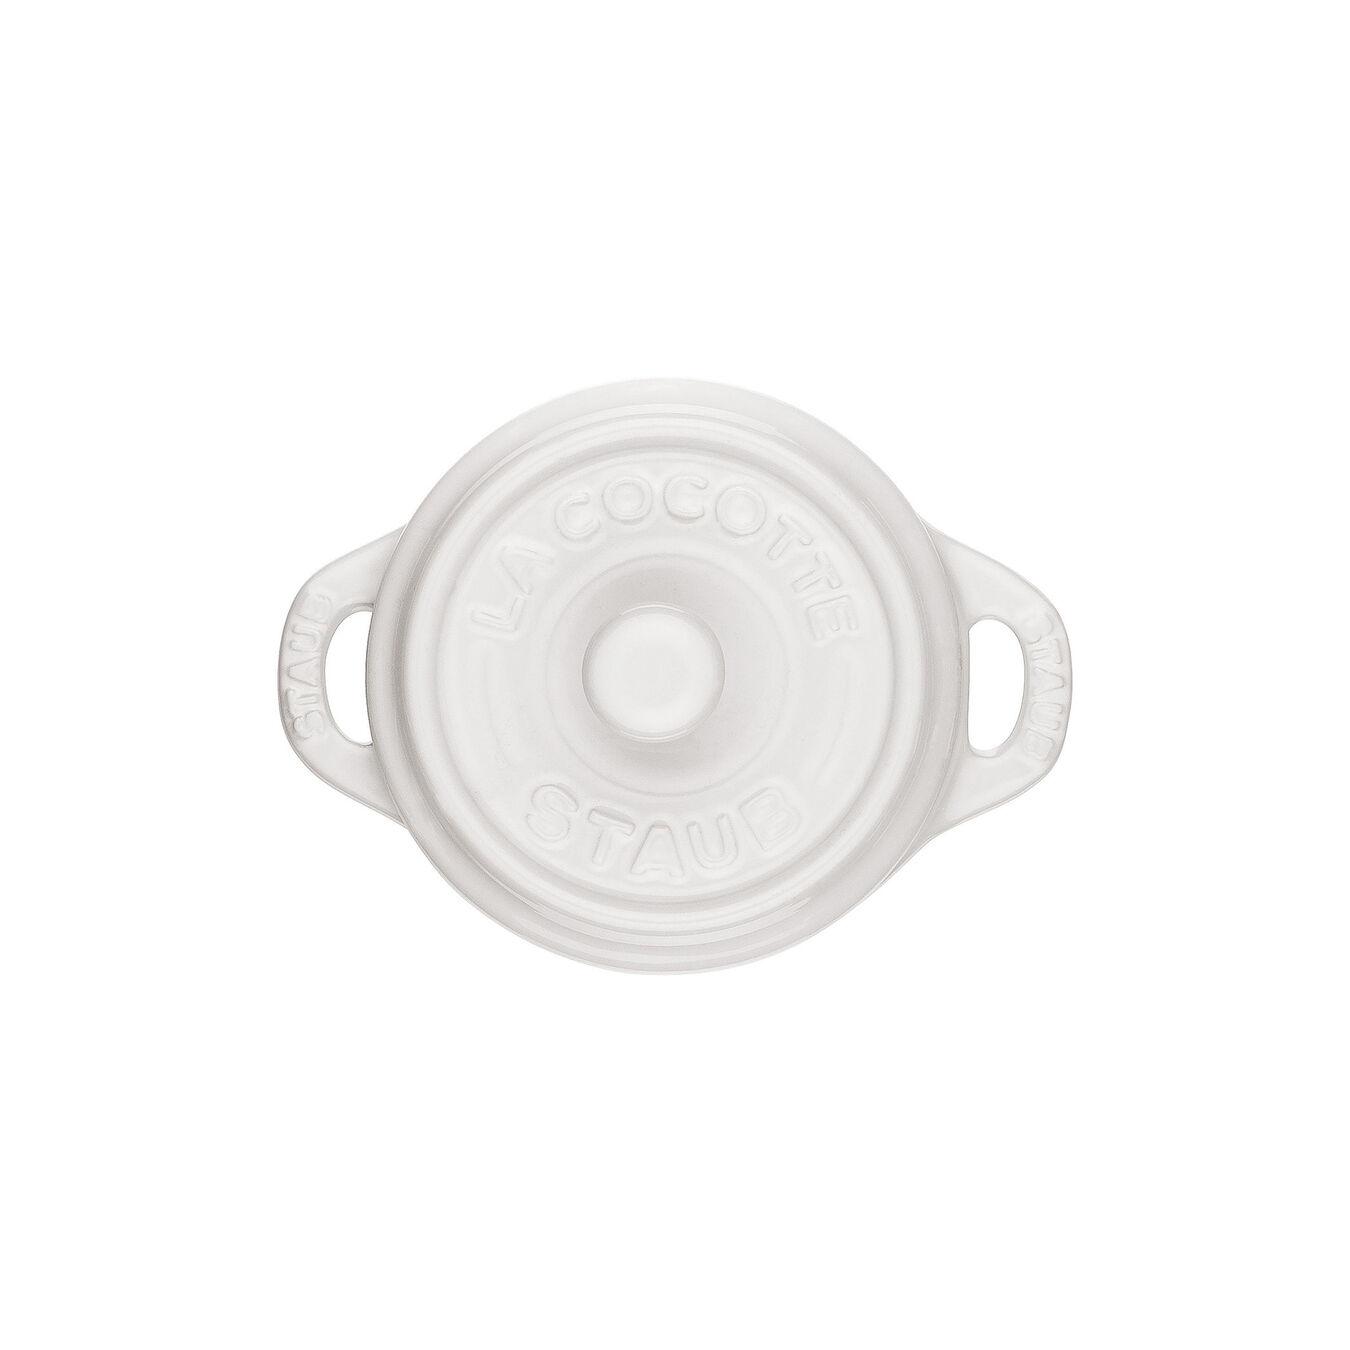 Mini Cocotte 10 cm, rund, Reinweiß, Keramik,,large 3